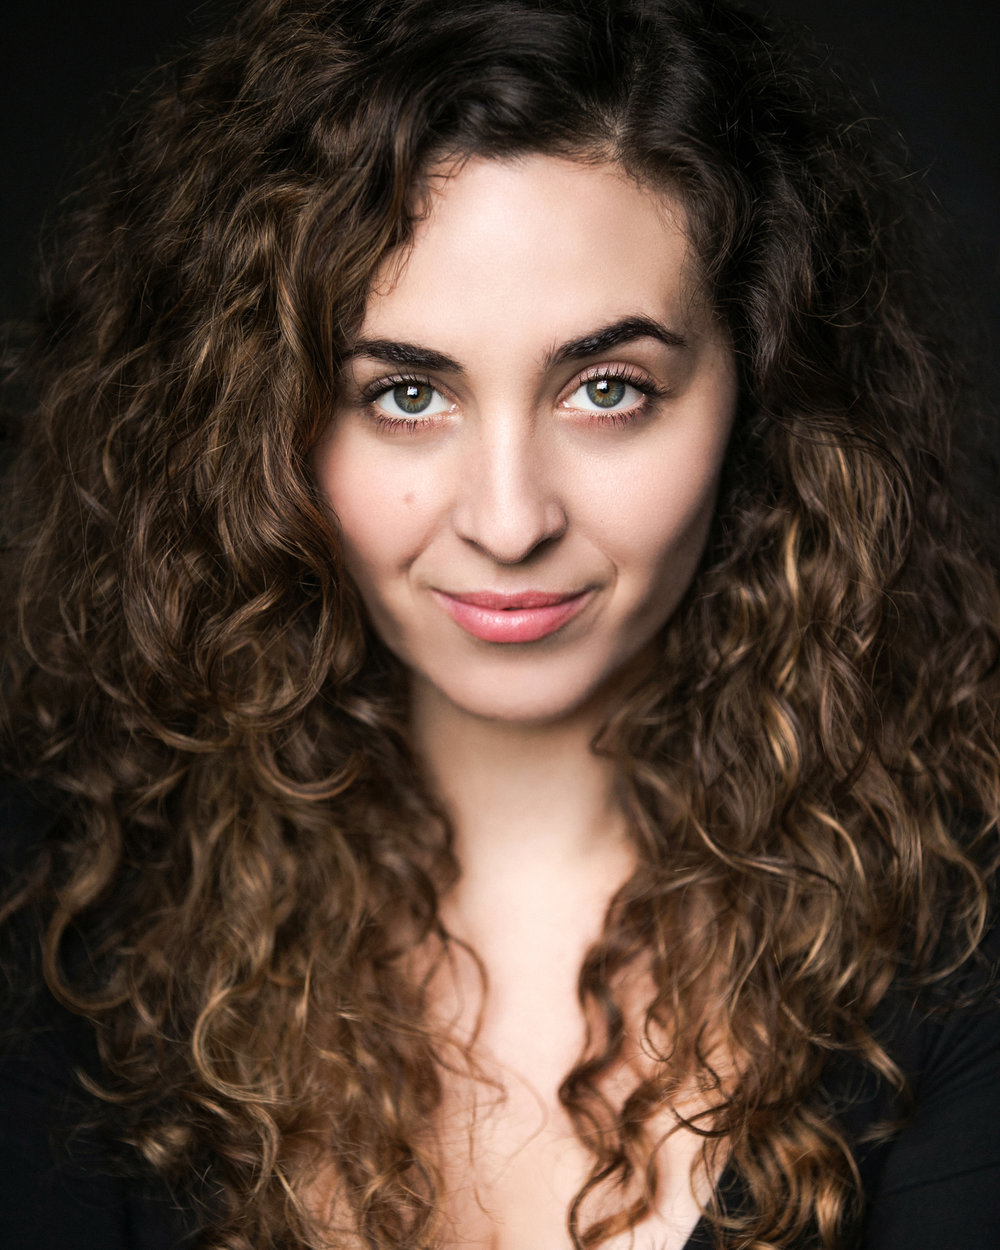 Afreen: Lara Sawalha